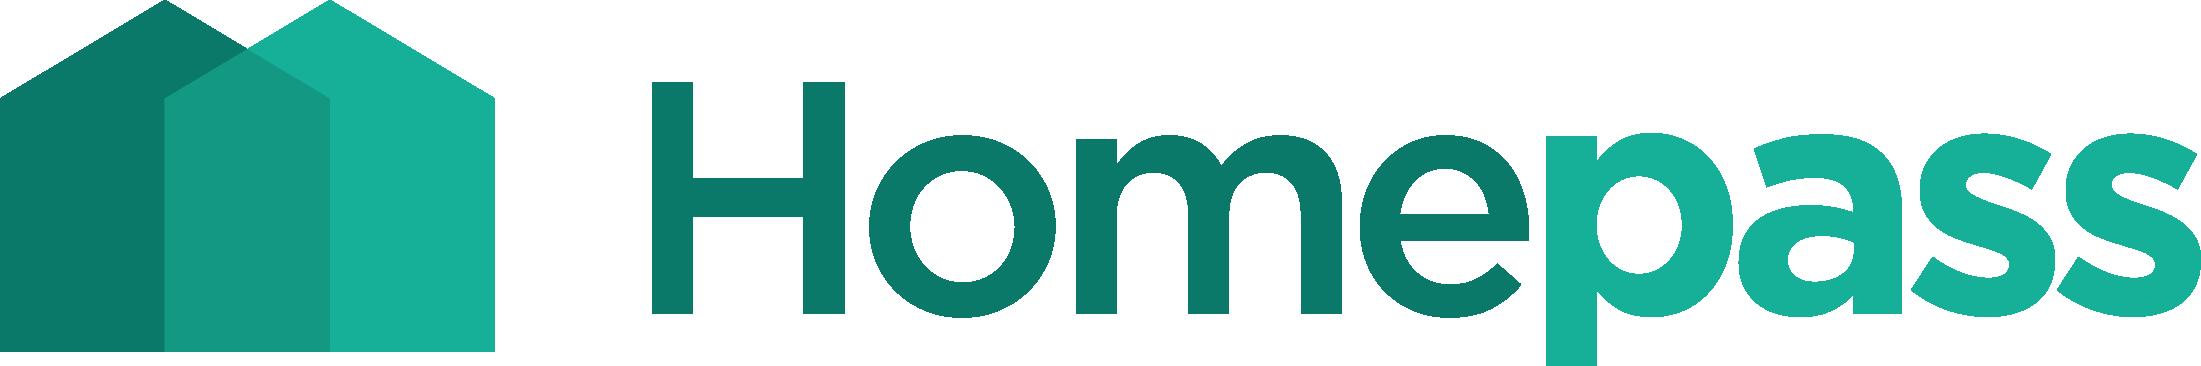 Design a modern logo for a disruptive online apartment rental marketplace